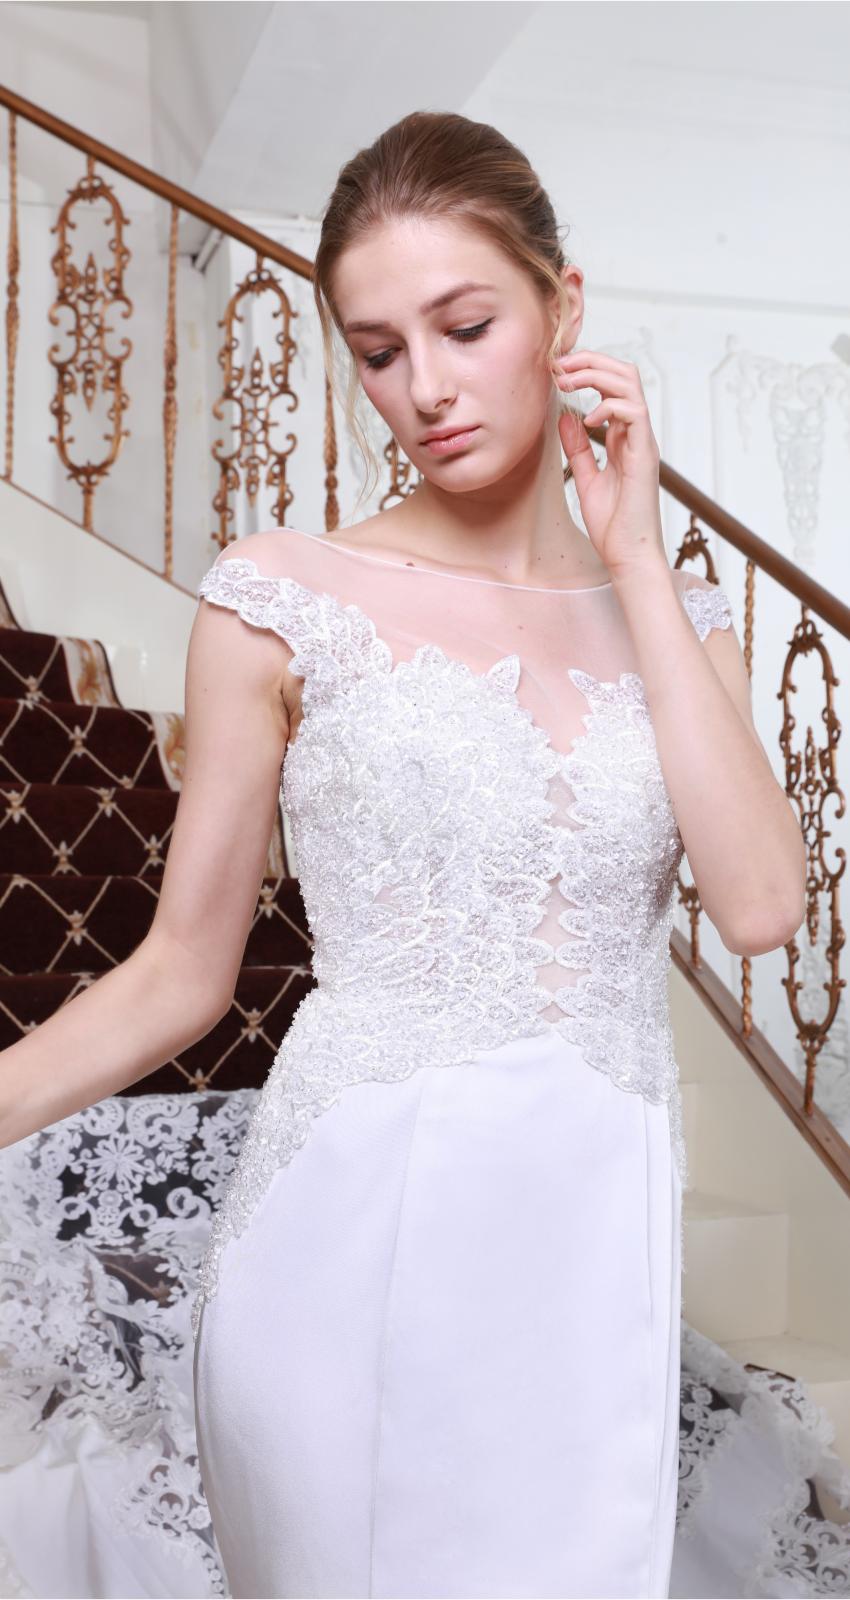 Vivienne Atelier Bridaldress Style Shoot 2019 Weddingdress